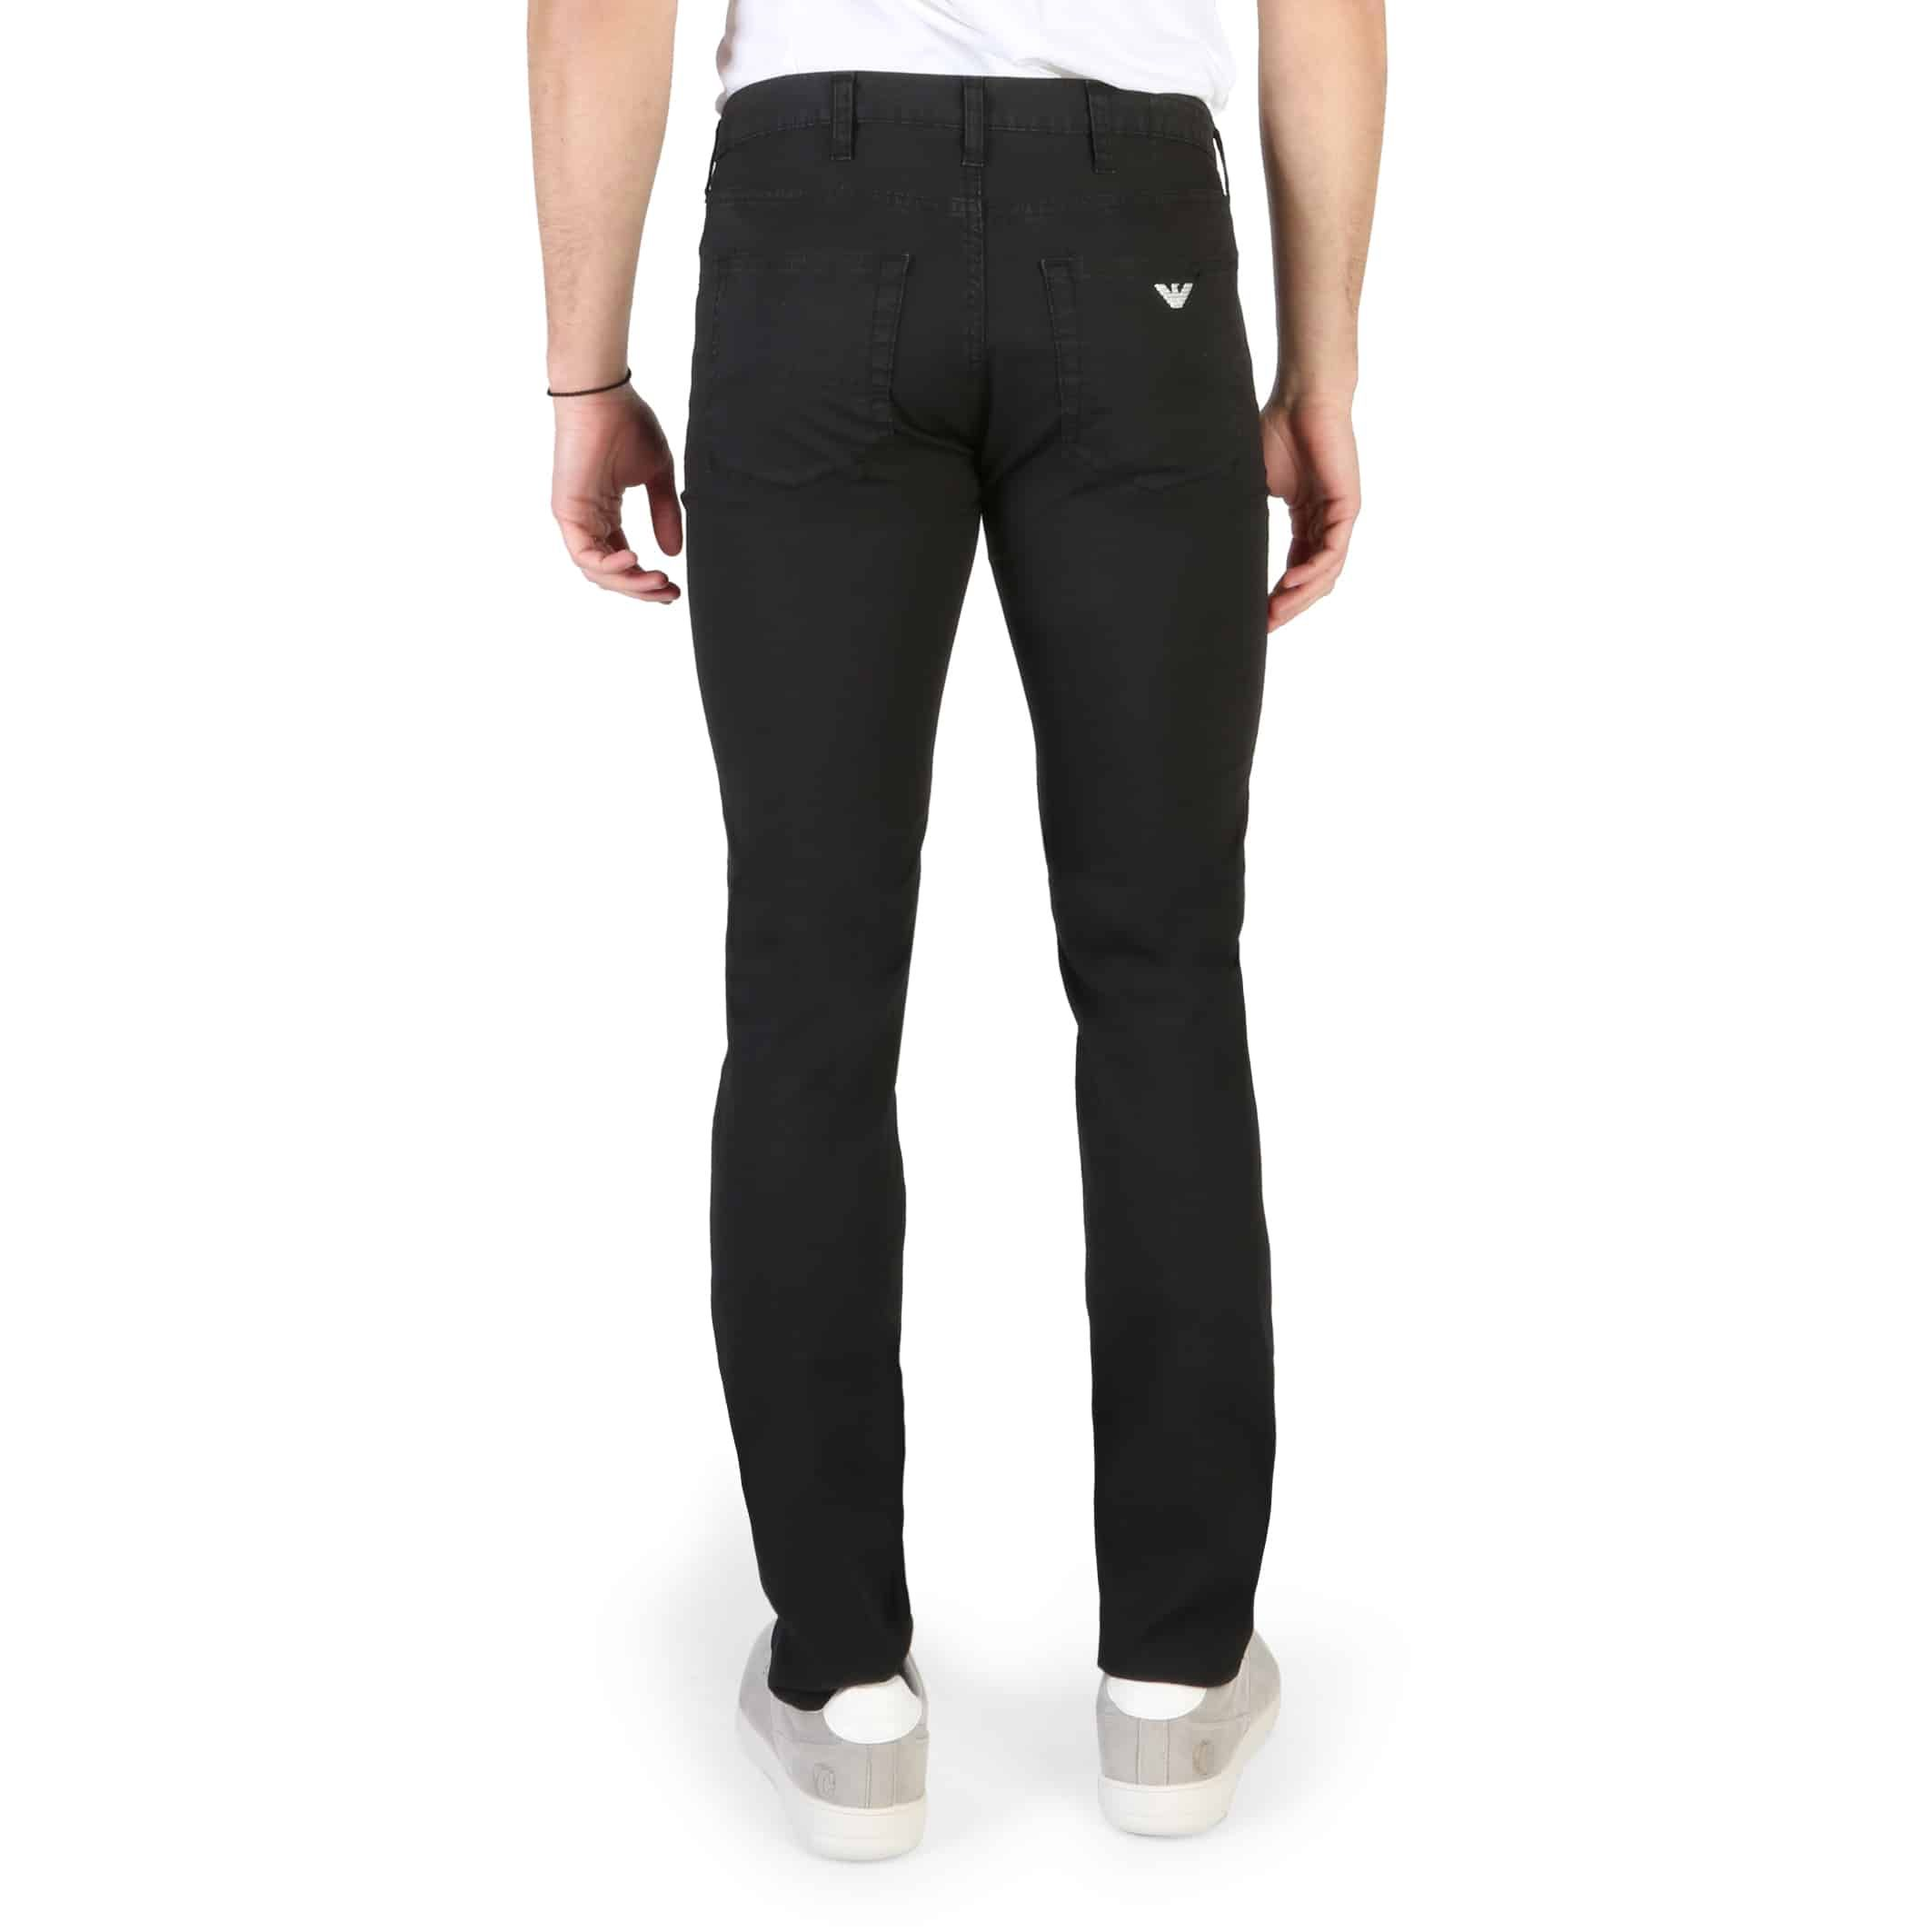 Armani Jeans – 3Y6J45_6N0UZ – Nero